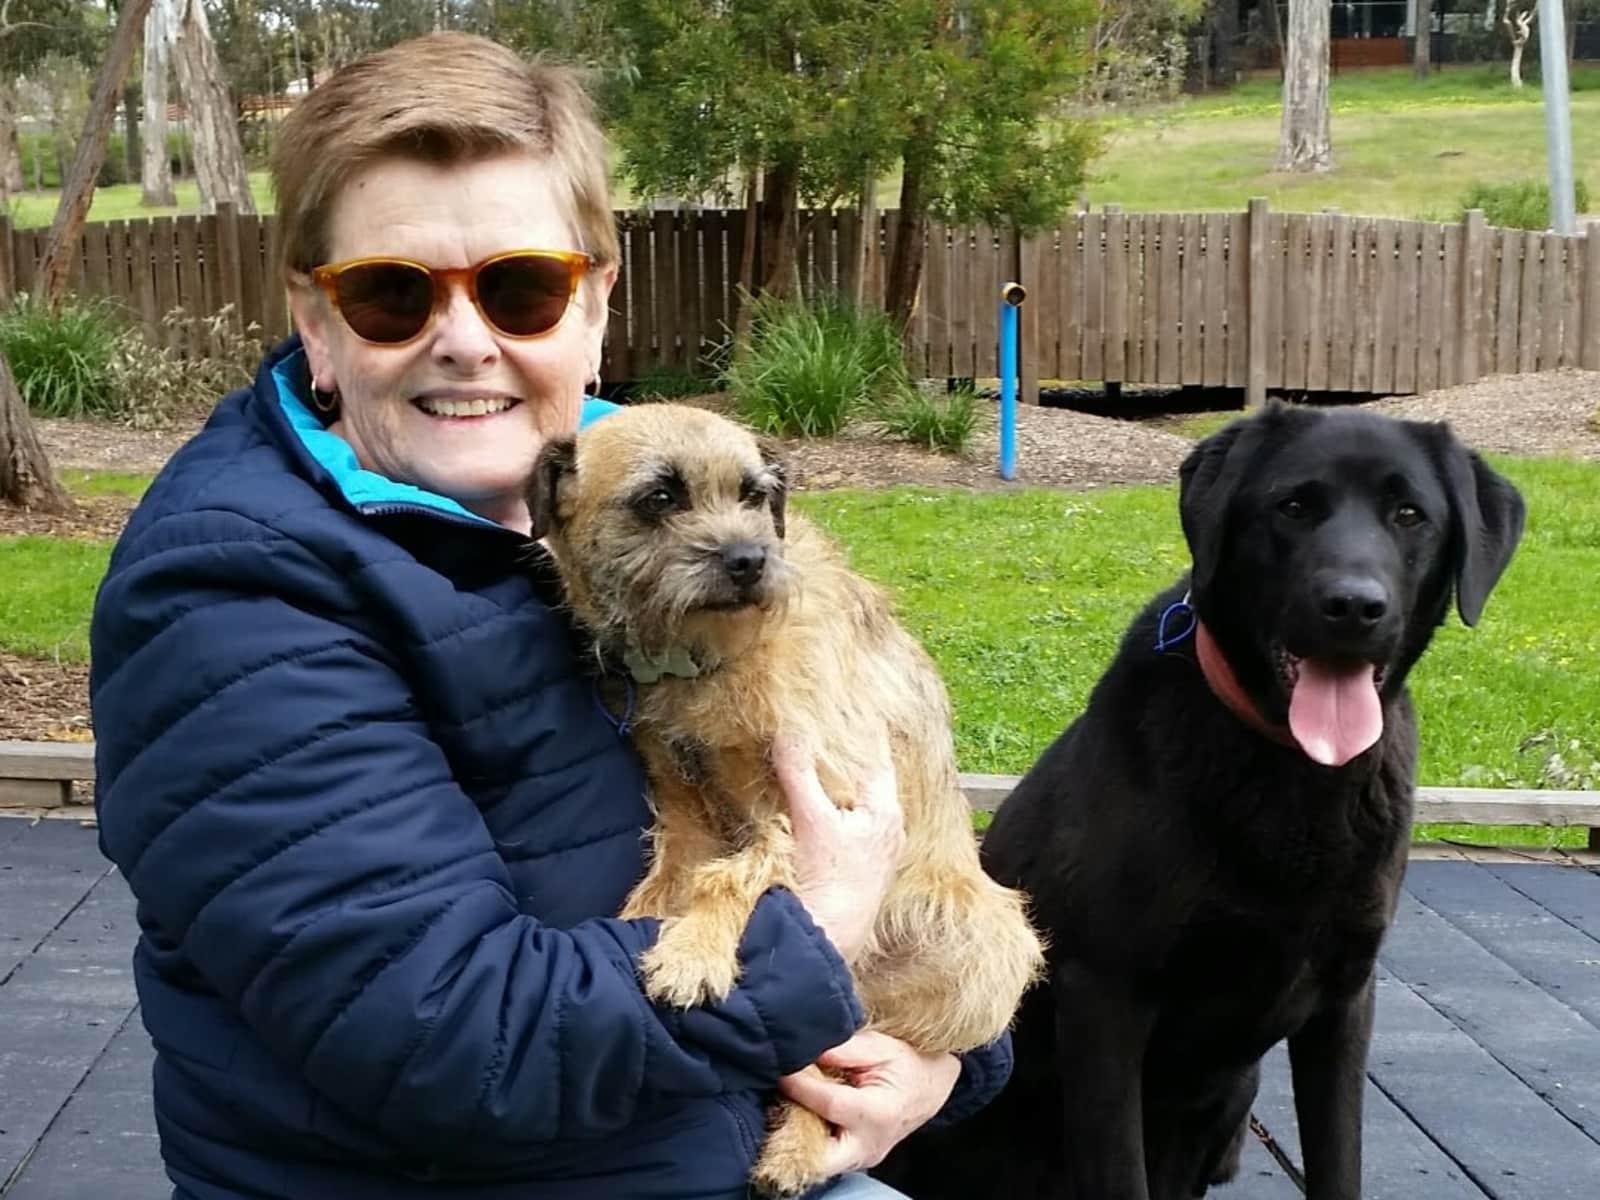 Janet from Melbourne, Victoria, Australia